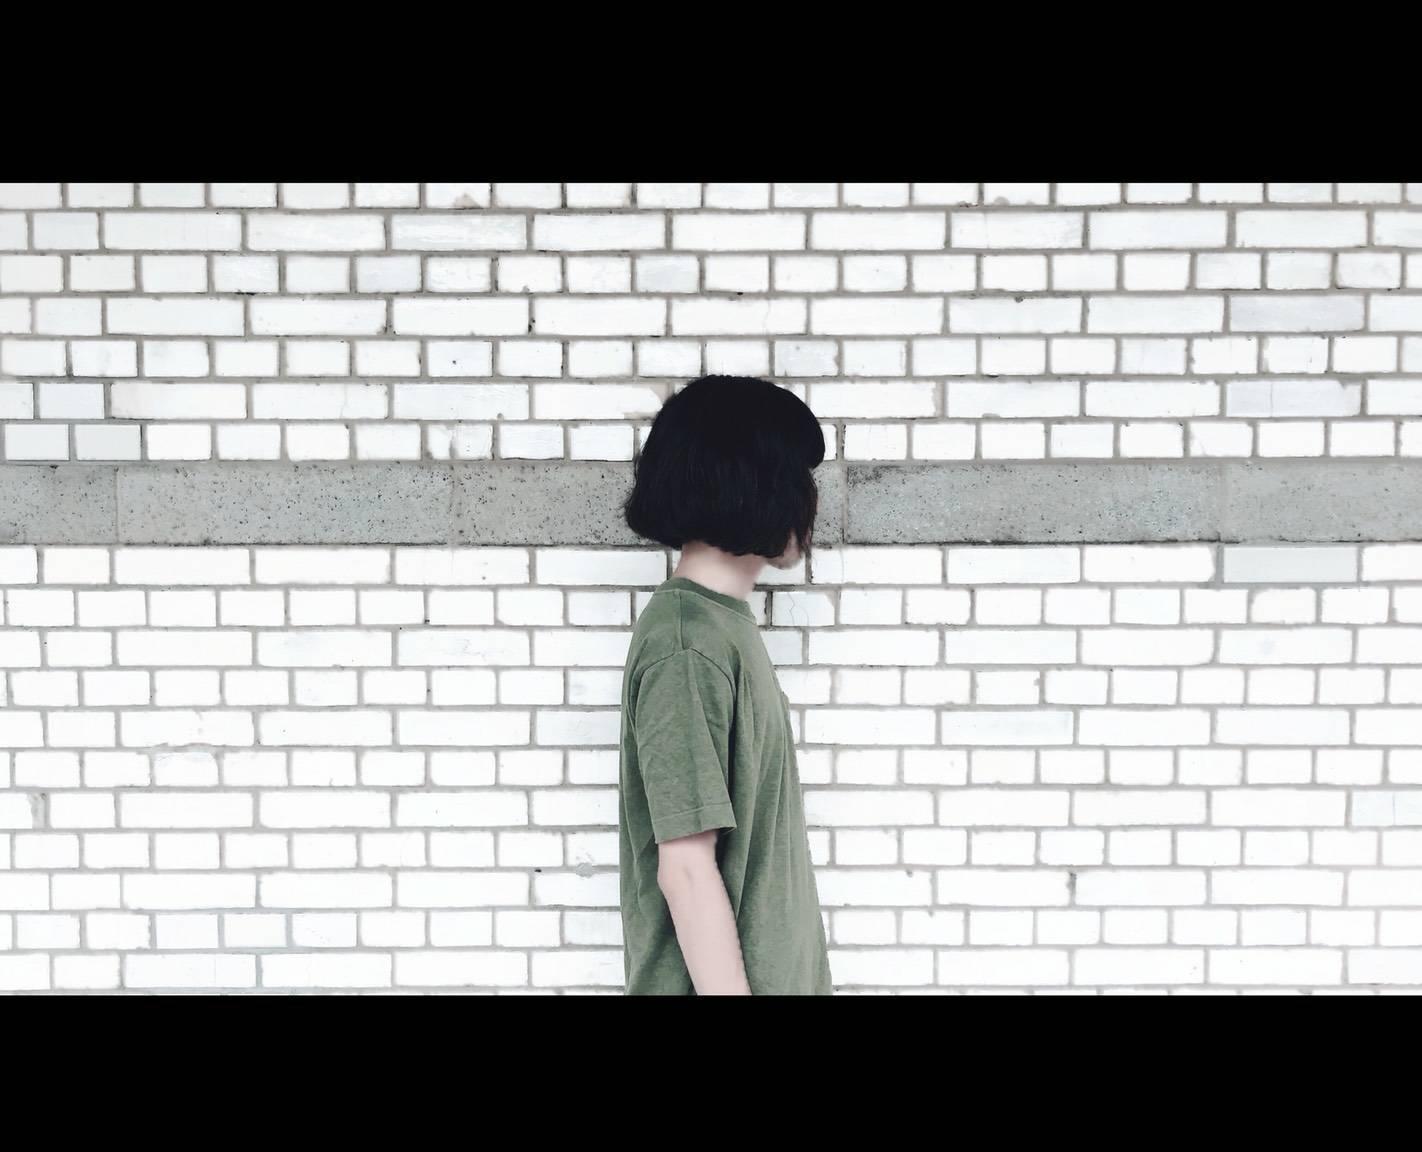 【Cuckoo(クーク)】あなたと作りたい!「シロクマの国」Music Video製作プロジェクト!!